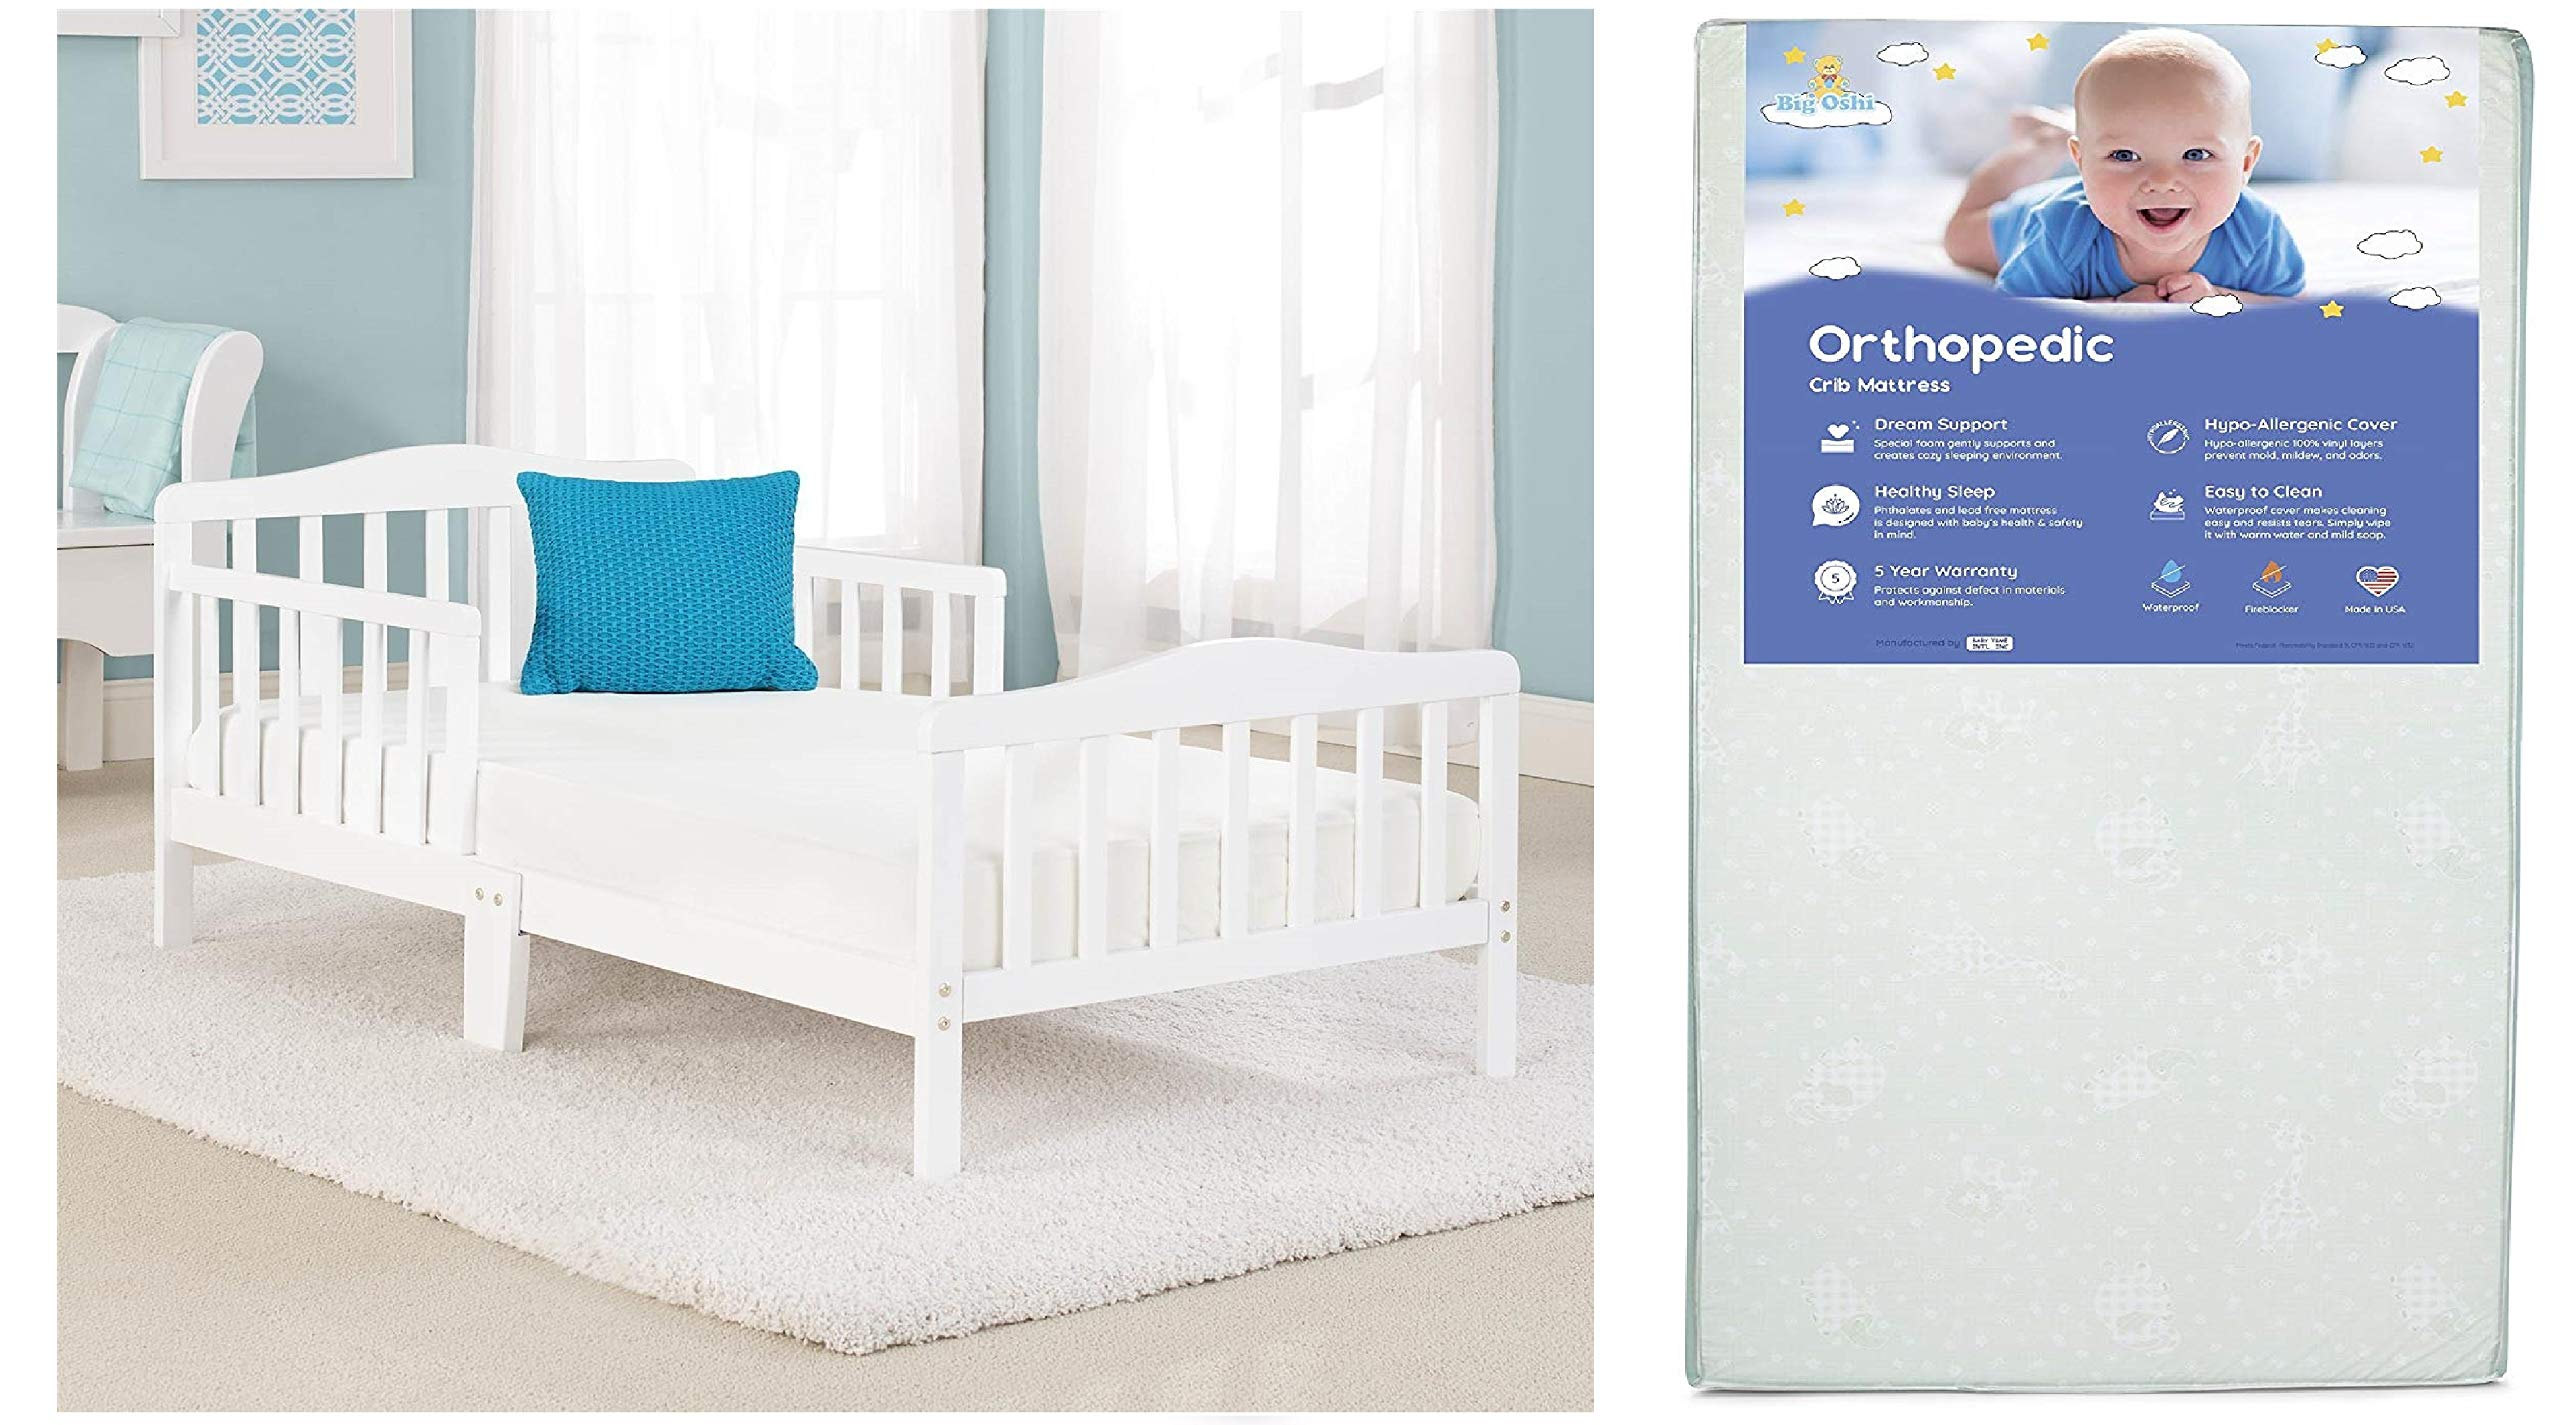 Big Oshi Contemporary Toddler Bed & Mattress Bundle, Waterproof, Non-Toxic Mattress, White Bed Bundle by Big Oshi